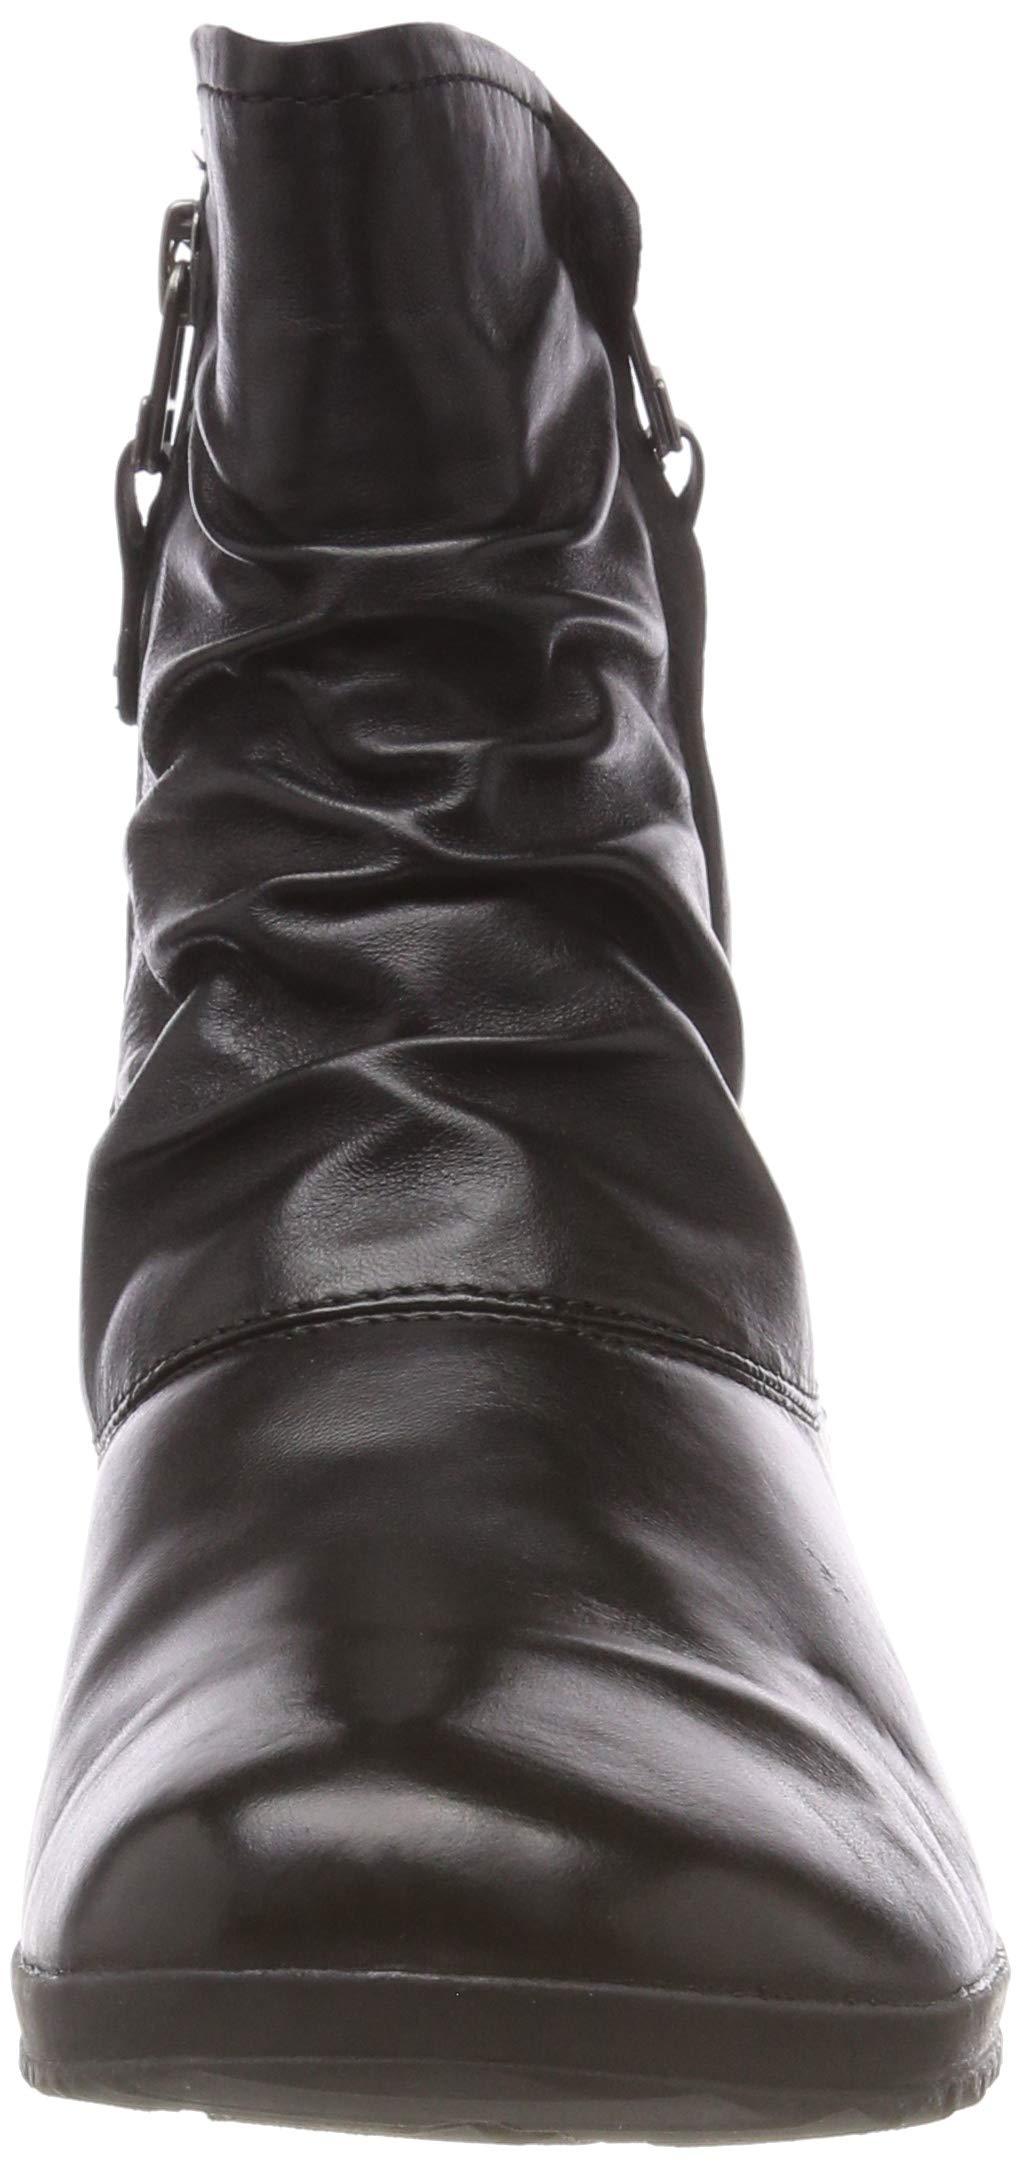 Josef Seibel Women's Naly 24 Slouch Boots 4